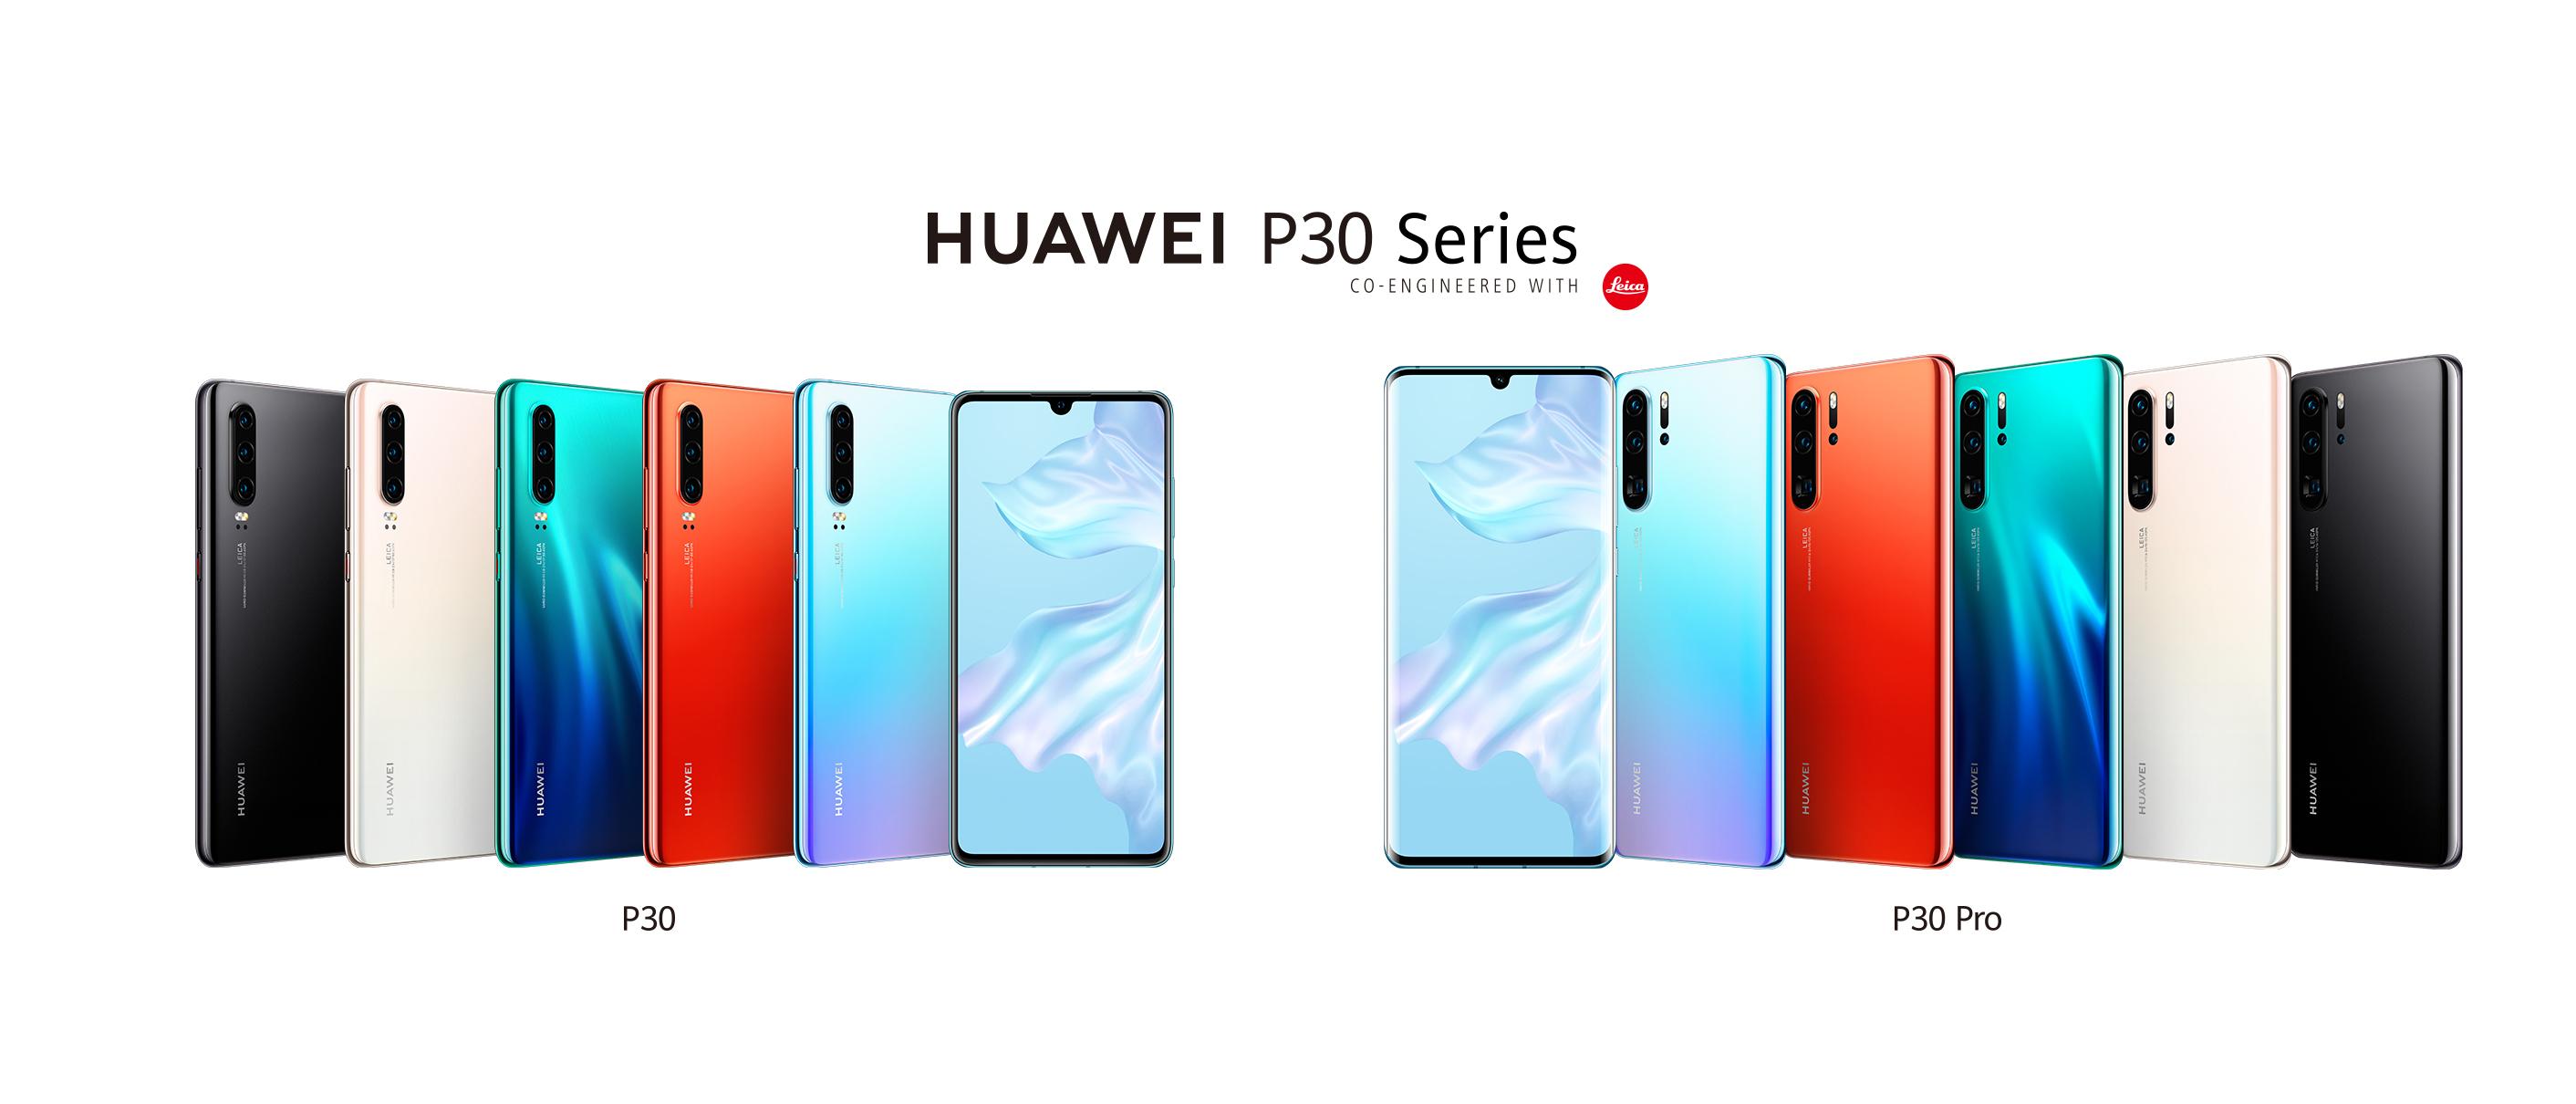 Huawei lanzó la Serie P30 en Colombia | EL FRENTE